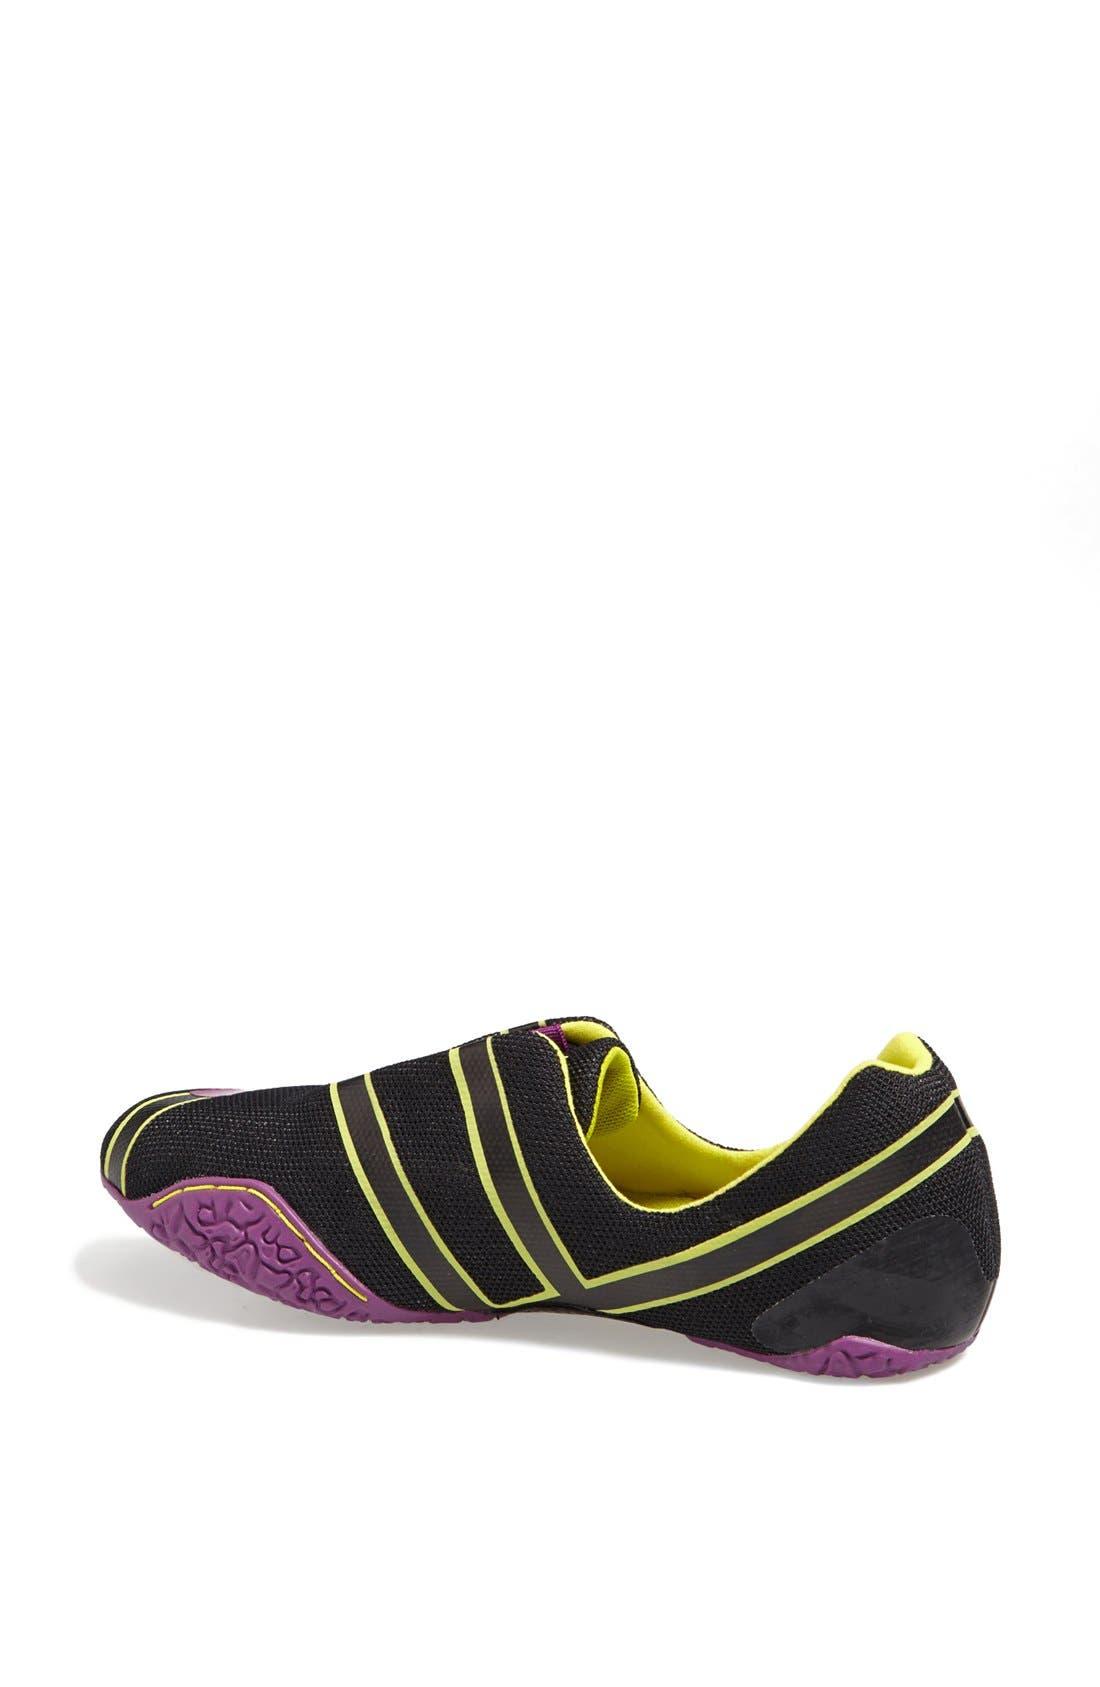 'Anaida' Foldable Sneaker,                             Alternate thumbnail 3, color,                             001